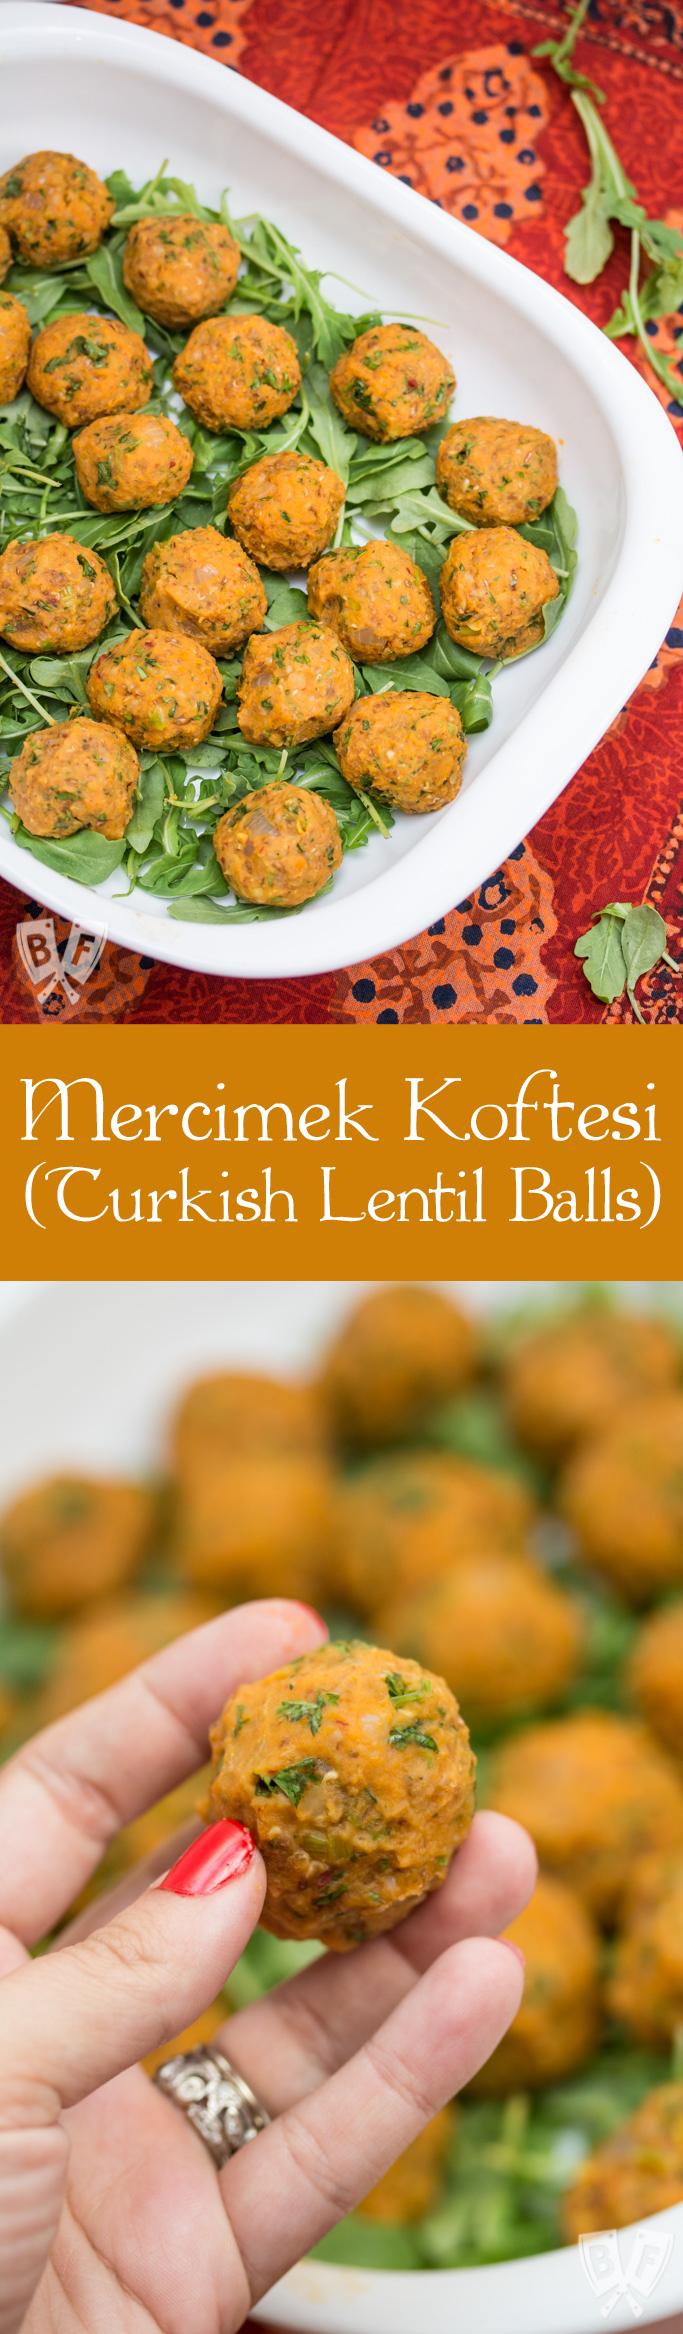 Mercimek Koftesi (Lentil Balls): Turkish red pepper paste adds deep, rich flavor to these hearty vegan bites!